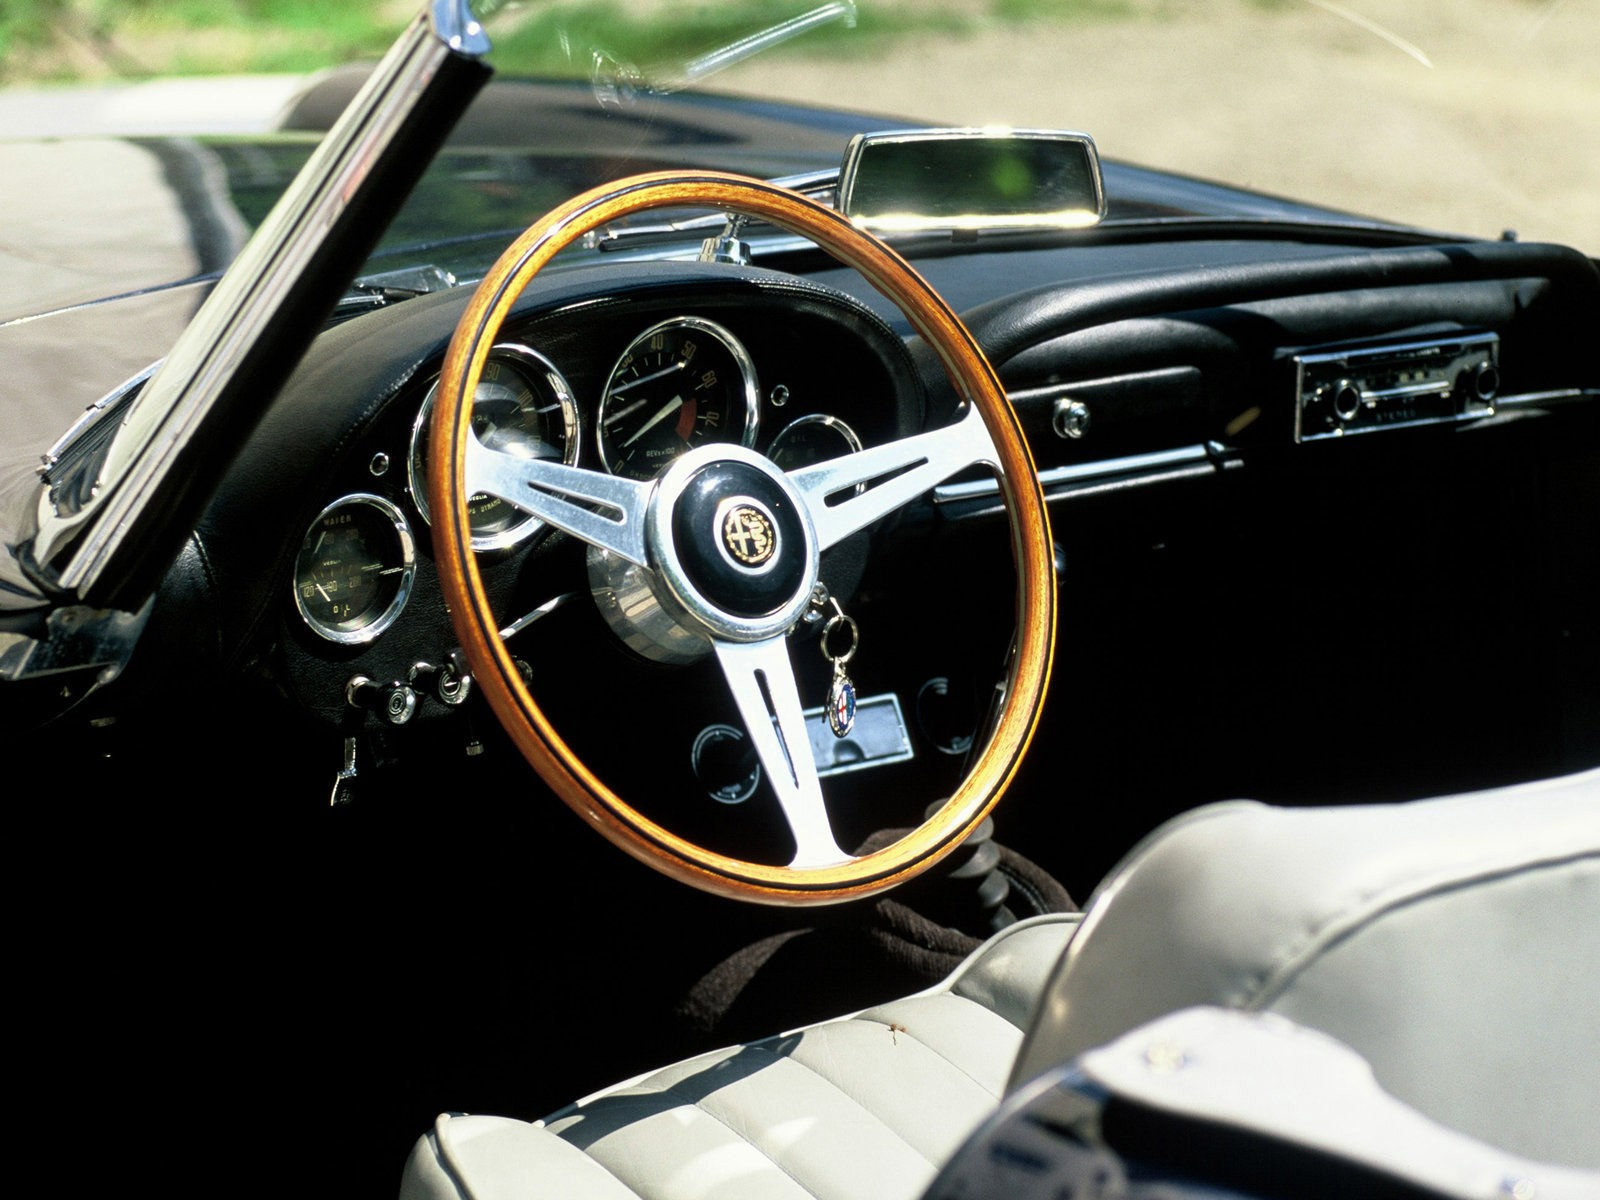 alfa romeo 2600 spider specs - 1962, 1963, 1964, 1965 - autoevolution